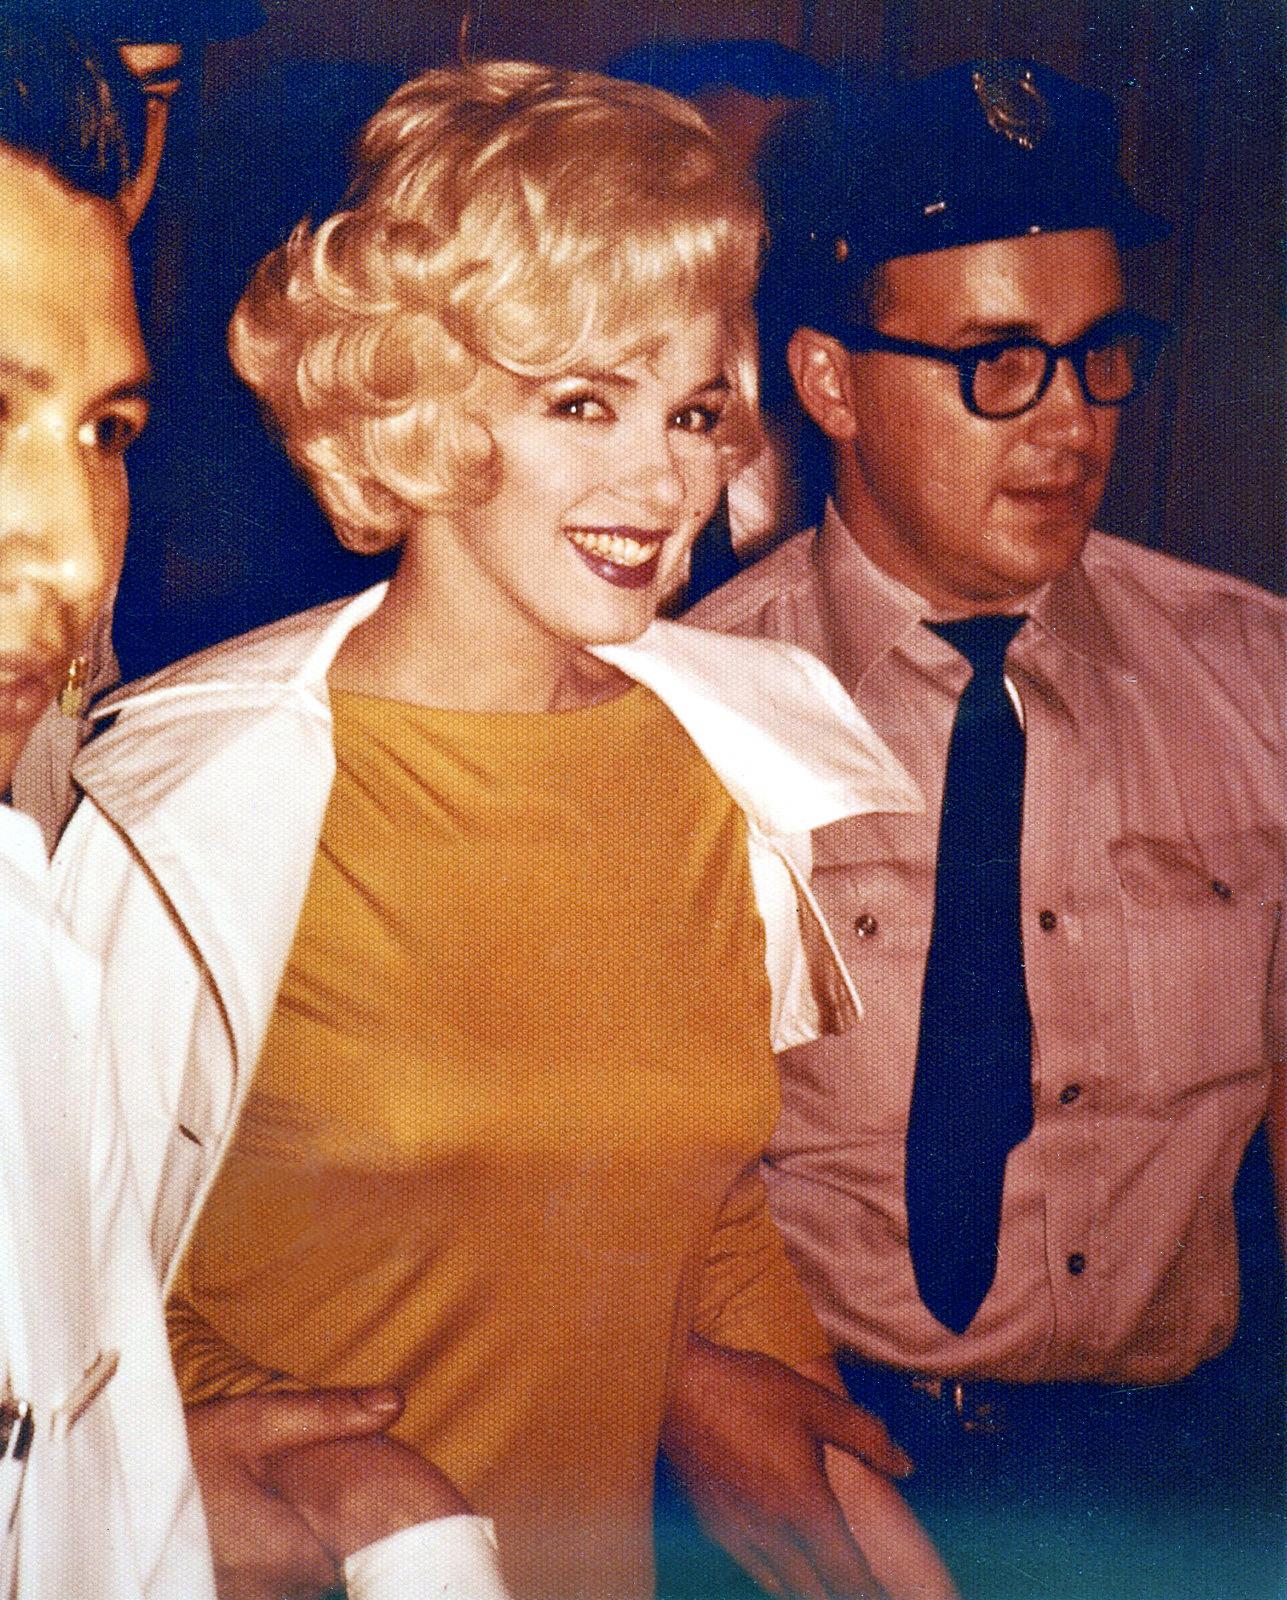 Sortie du Polyclinic Hospital, New York - juillet 1961